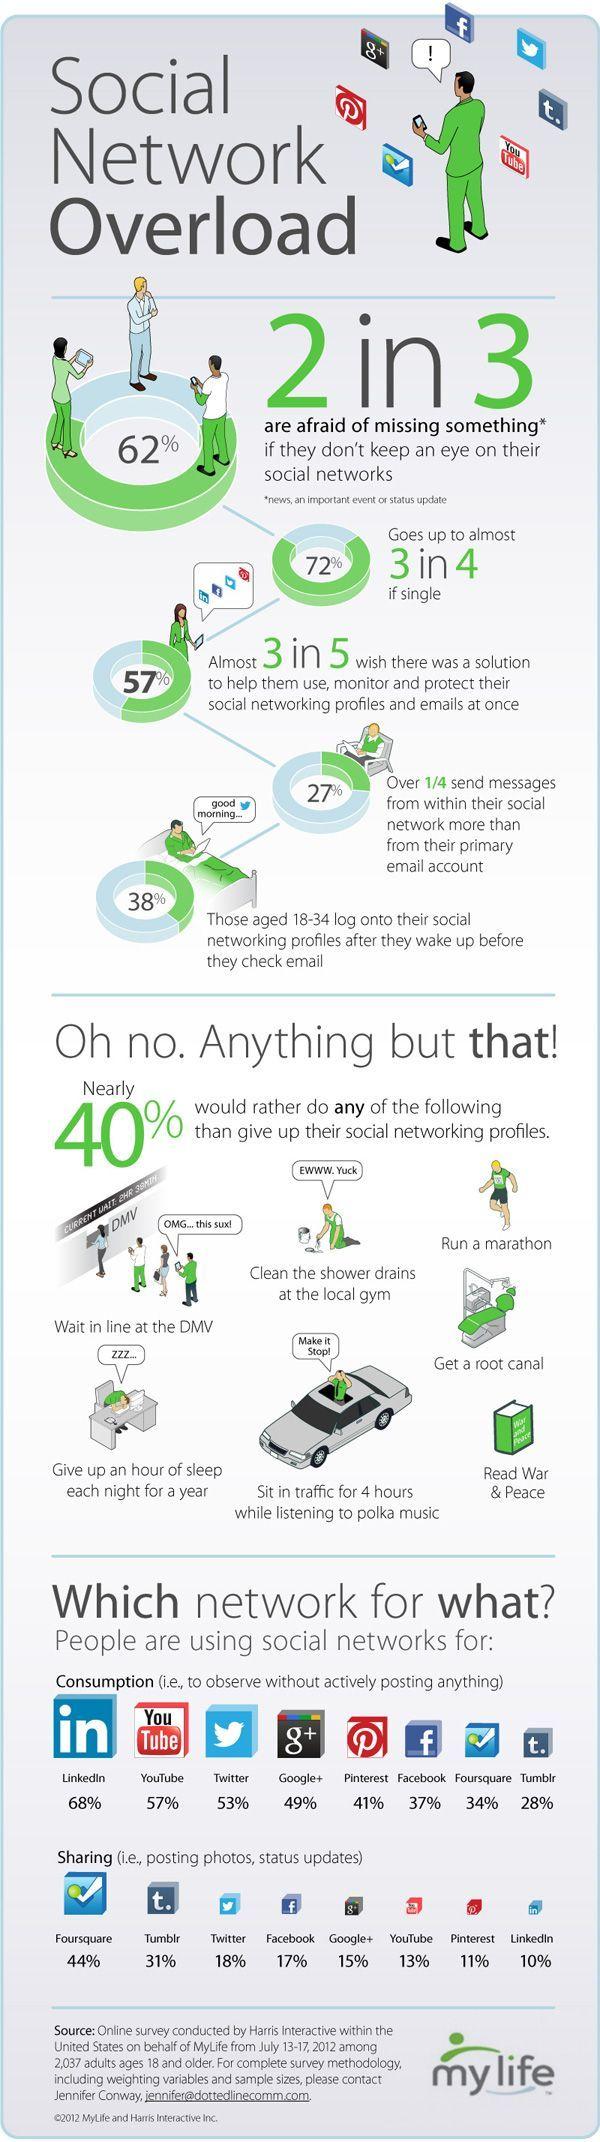 SocialNetworkOverload